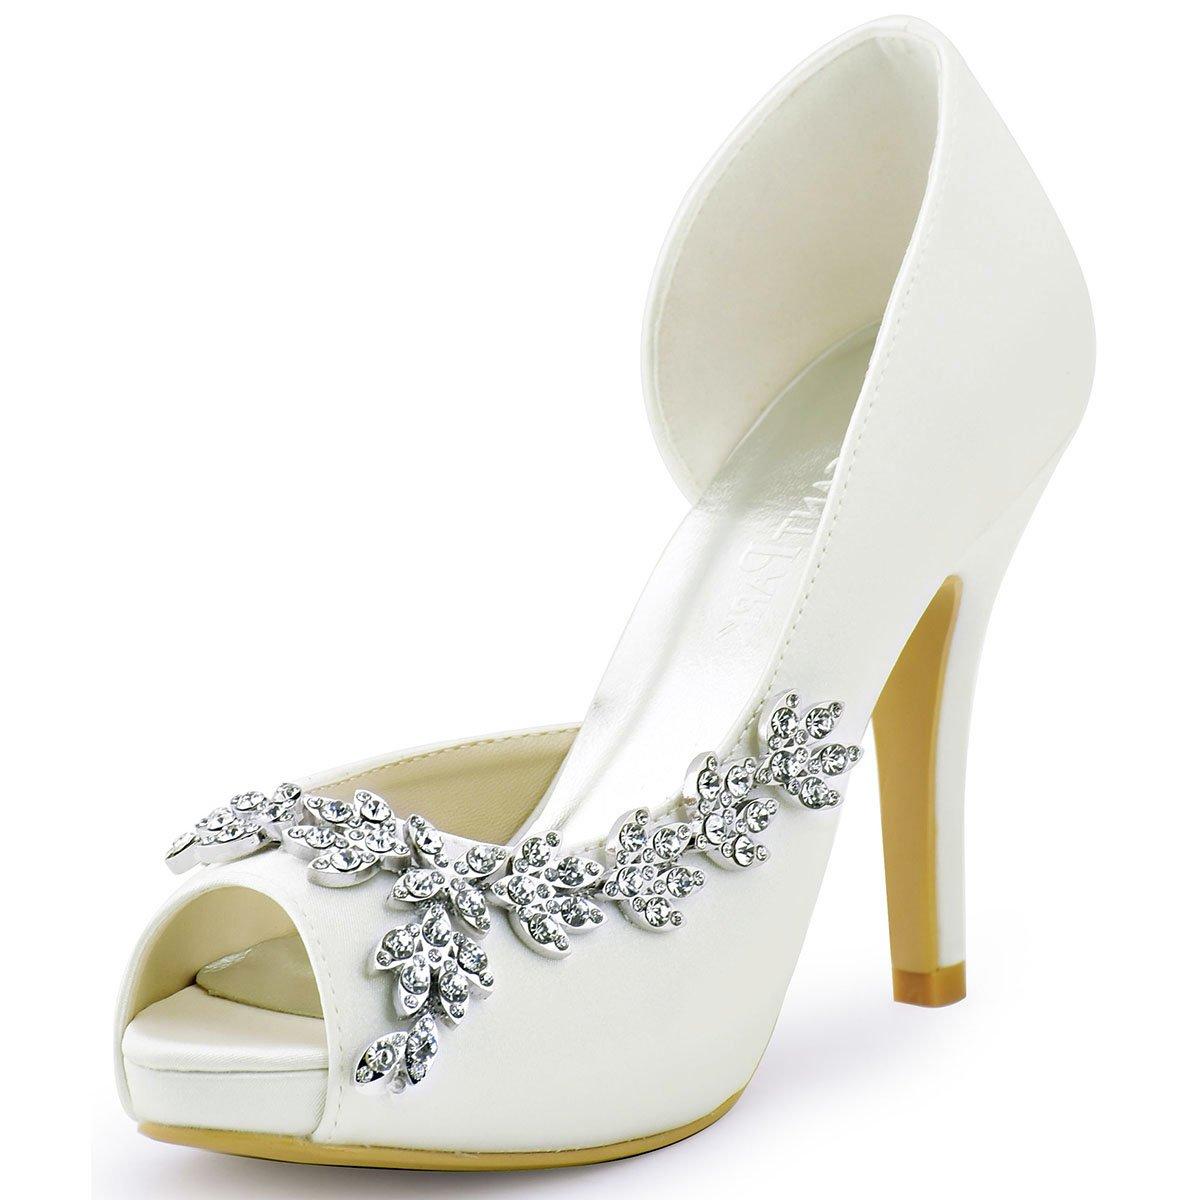 8bfad5076ae8fb ElegantPark Women s Peep Toe Platform Platform Platform High Heel  Rhinestones Satin Evening Prom Wedding Shoes B018THY6X2